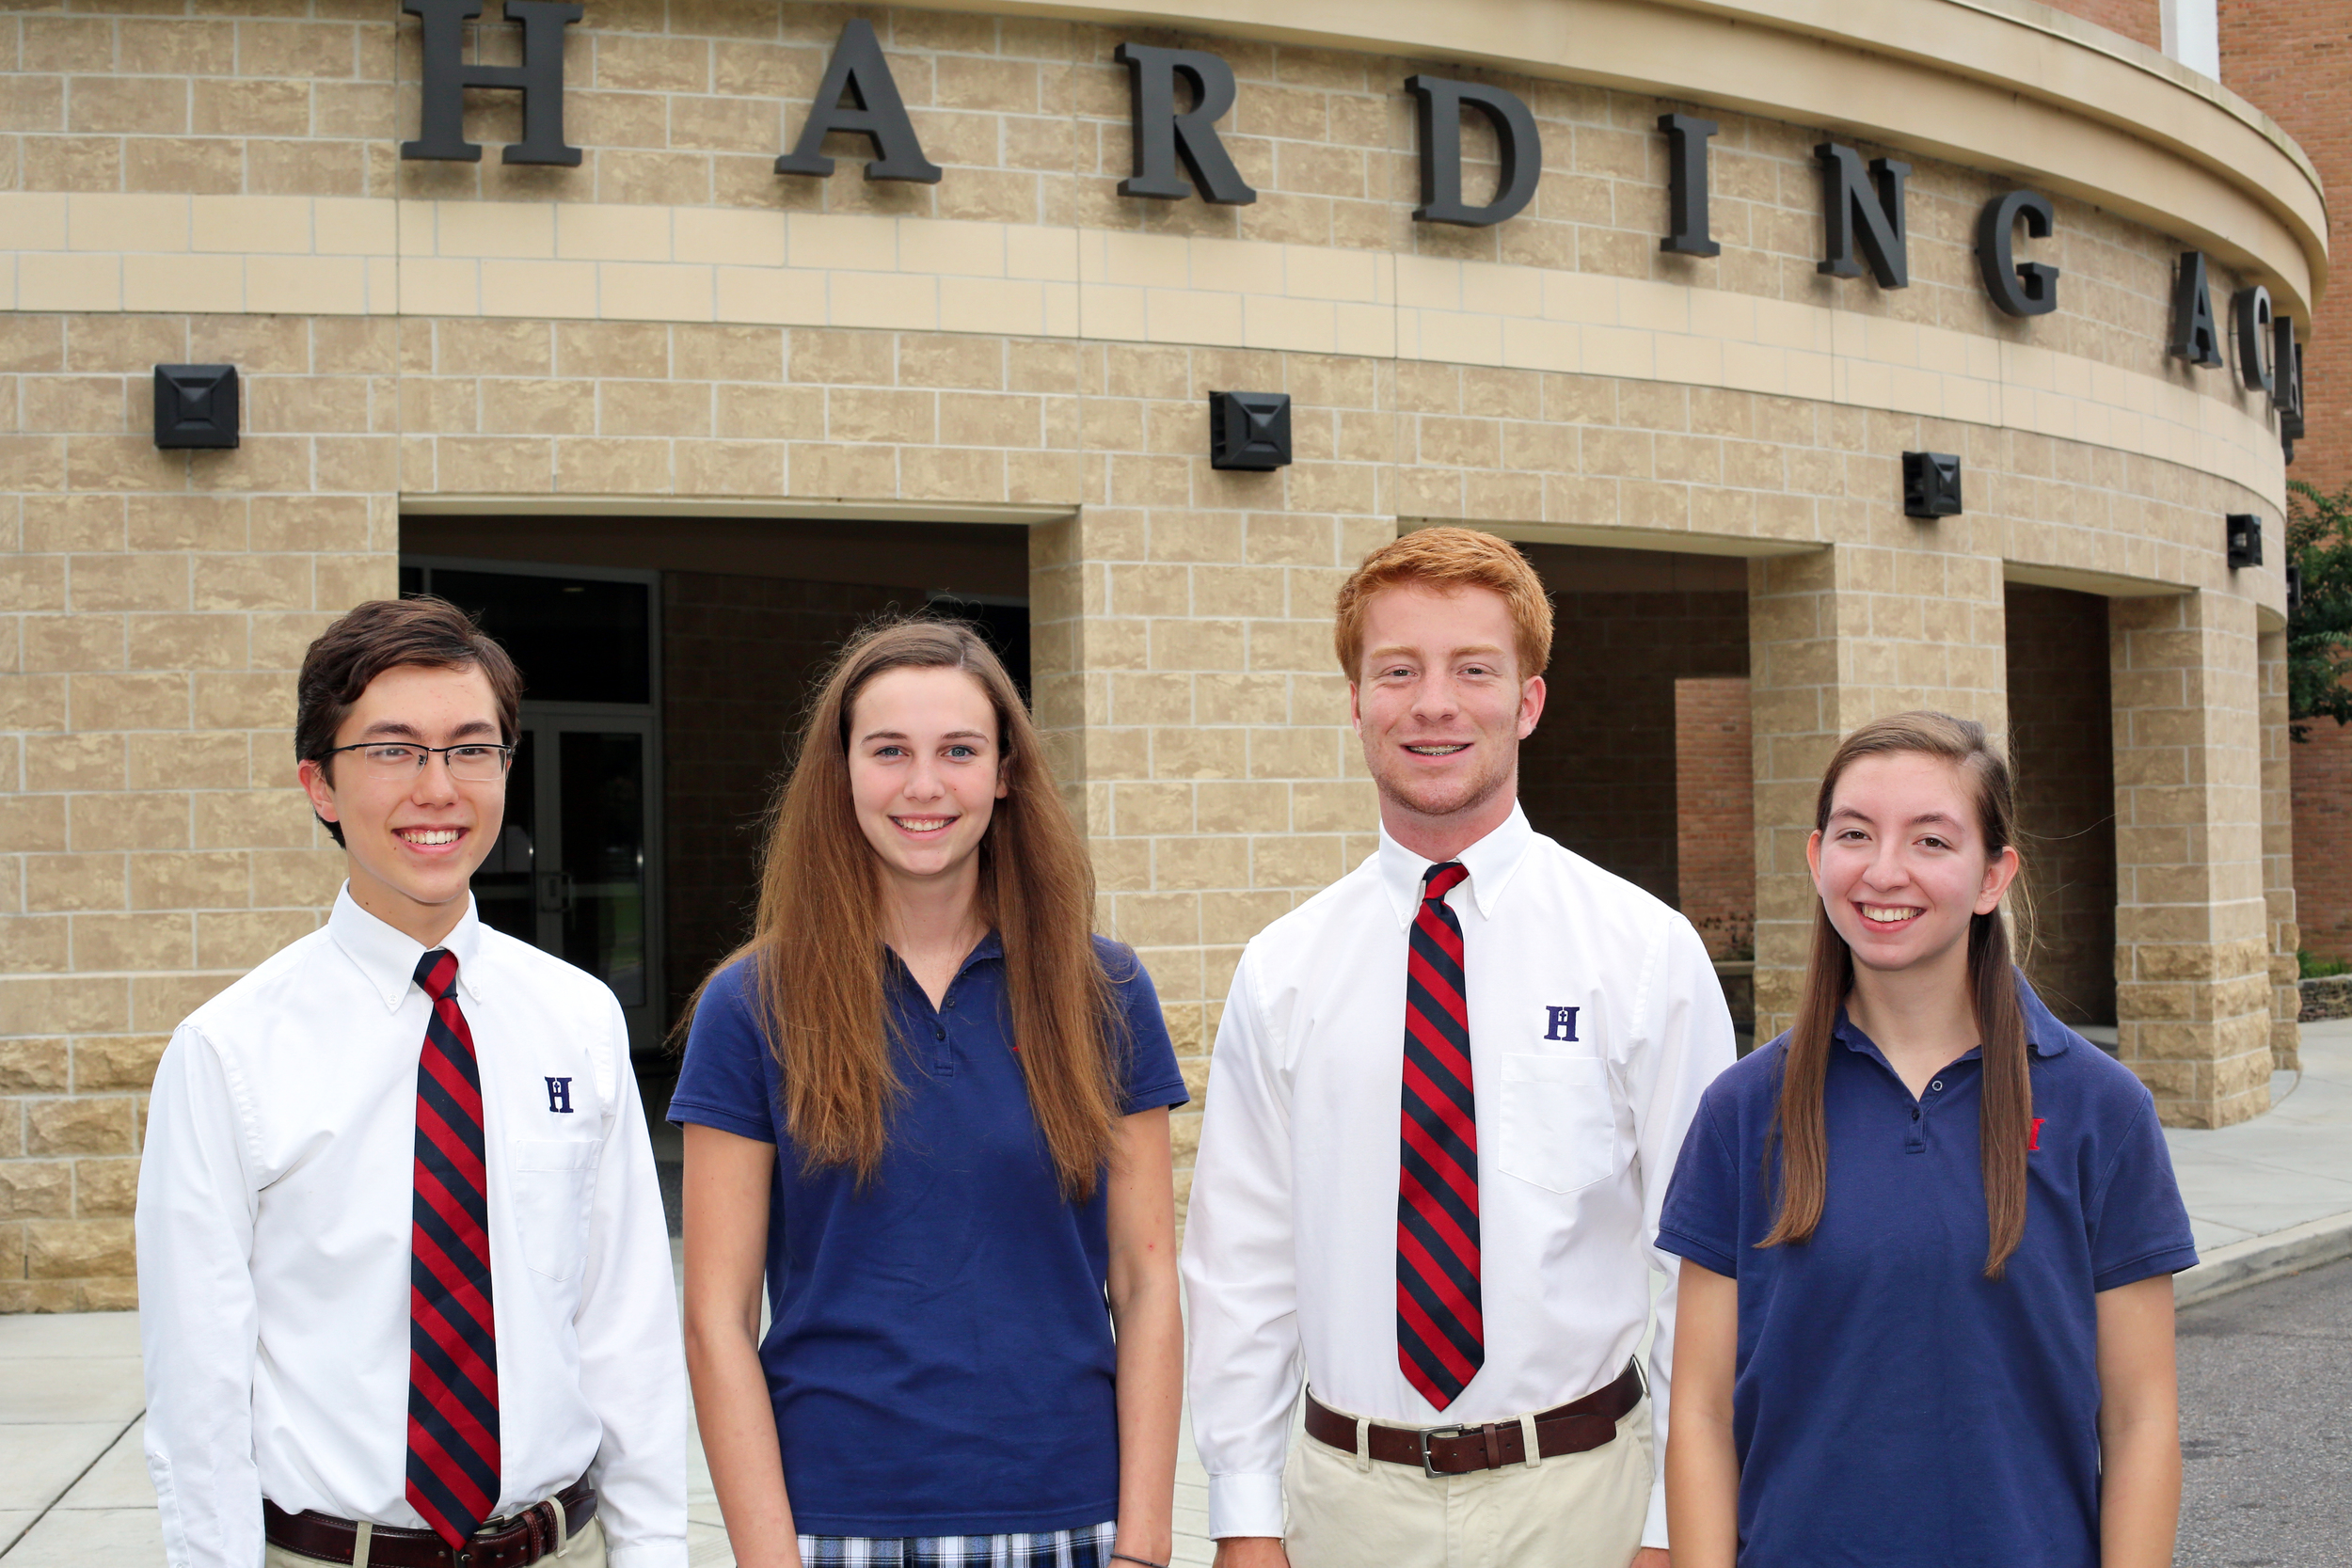 Finalists: Caleb Cranford, Anna Horner, Jack Webber; Commended Student: Hayley Ford